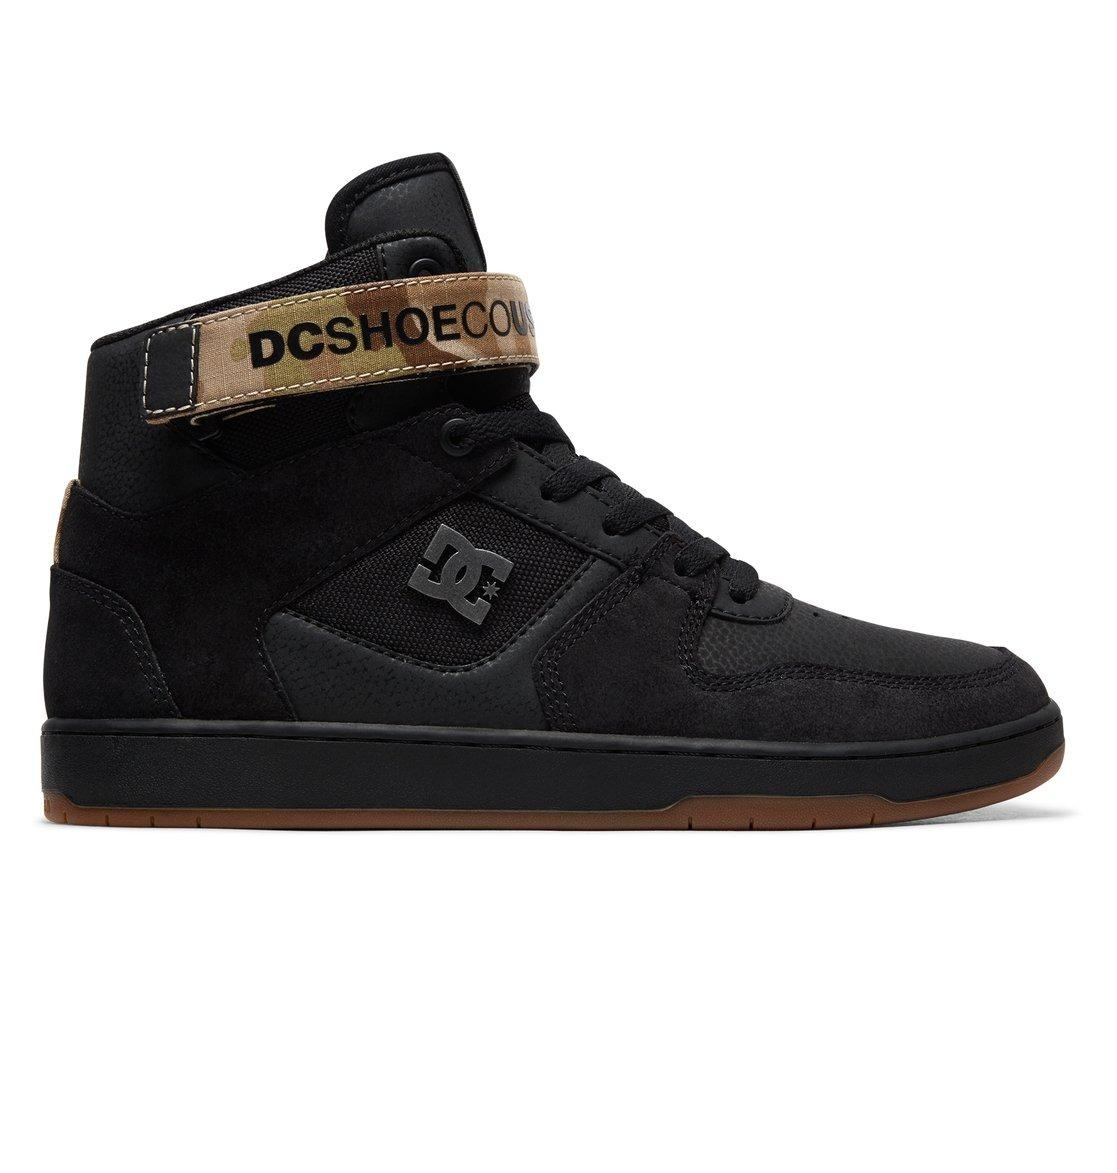 02ffea7f0b9d4 Tenis Botín Hombre Pensford Adys400038 Negro Dc Shoes -   1